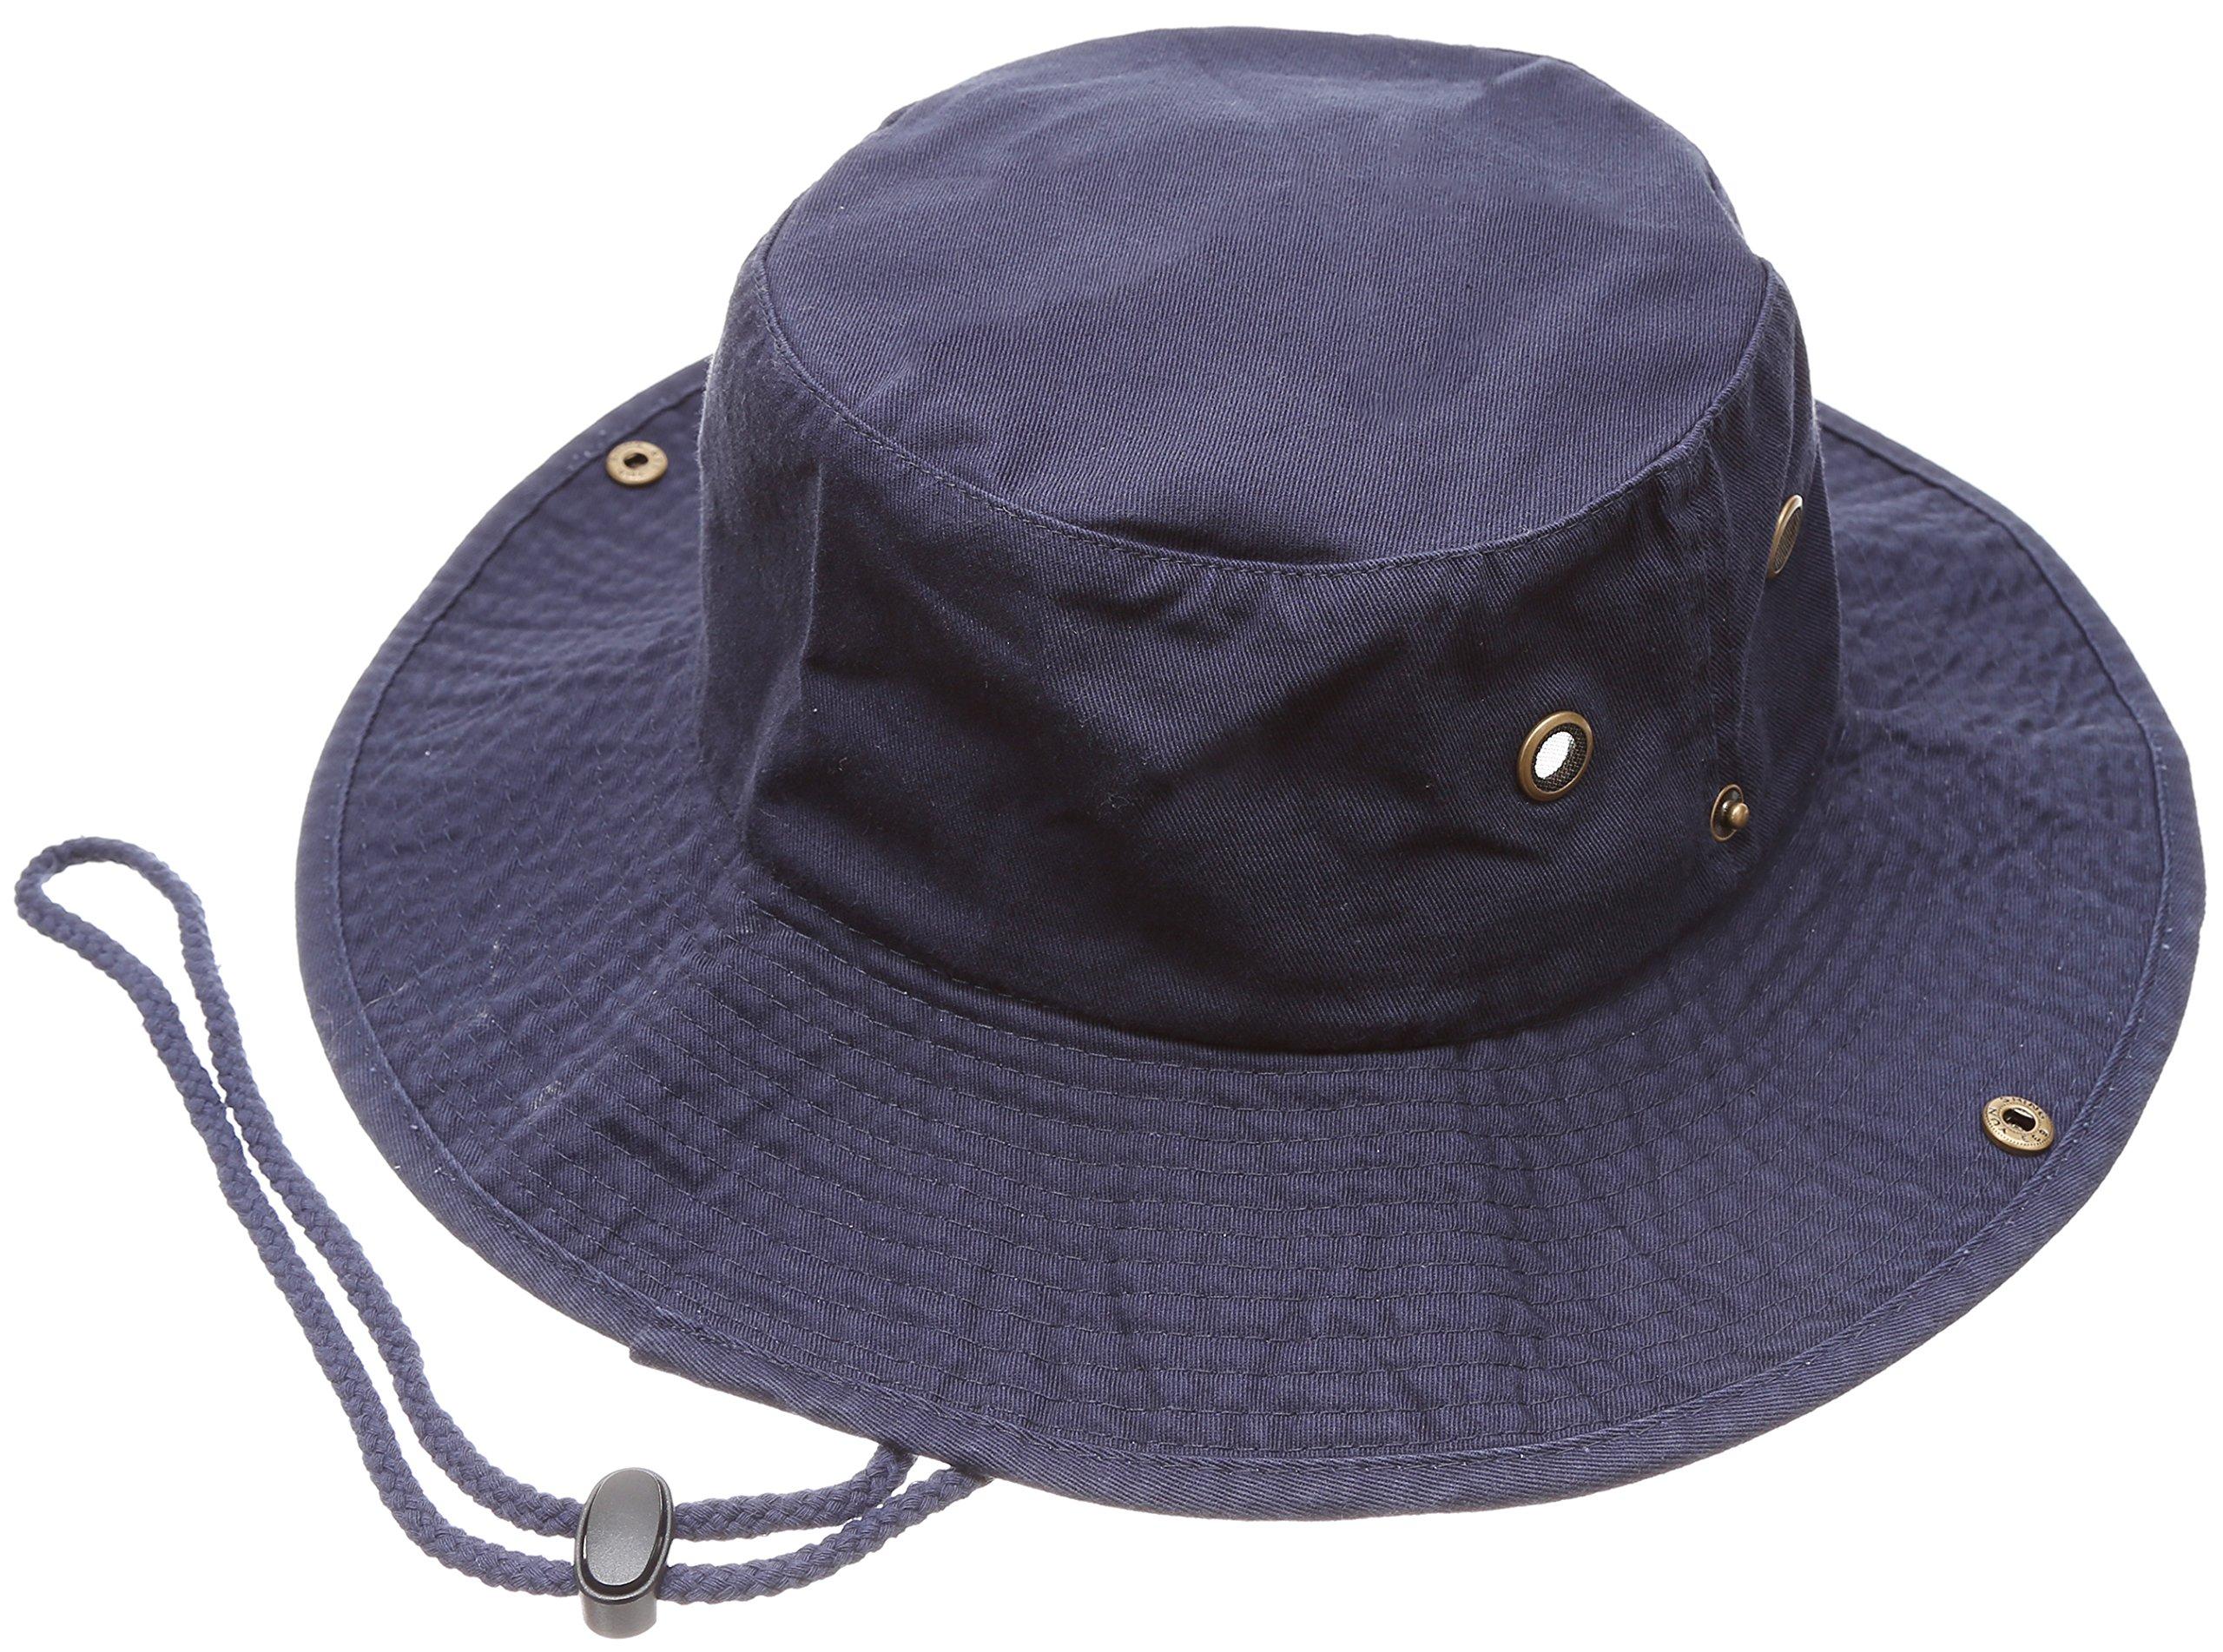 MIRMARU Summer Outdoor Boonie Hunting Fishing Safari Bucket Sun Hat with Adjustable Strap (Navy,SM)